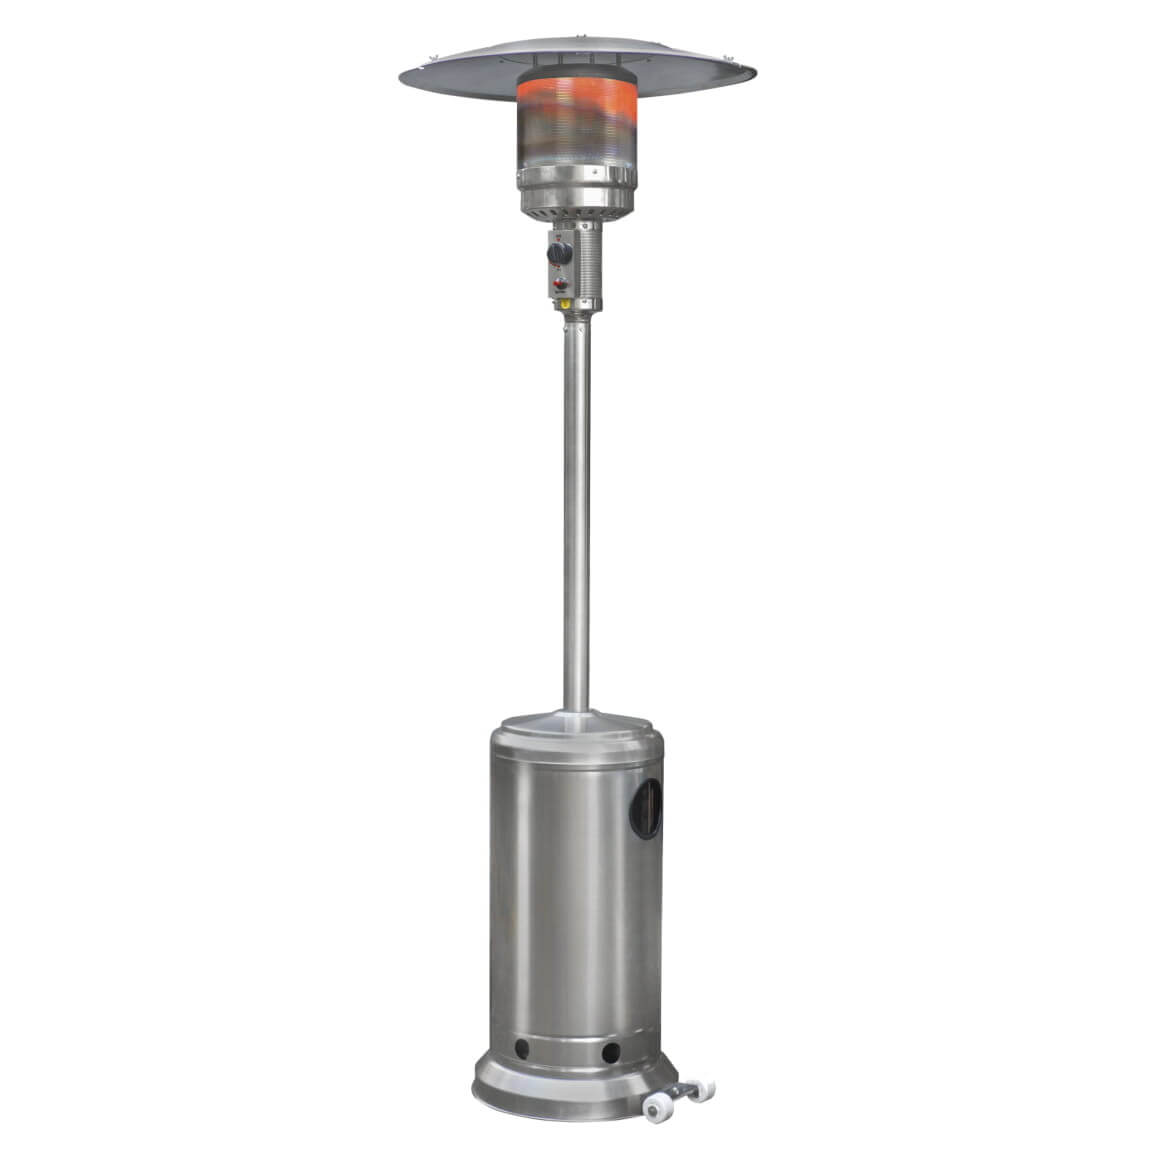 Eurom THG14000 RVS Terrasverwarmer op gas | RVS terrasheater